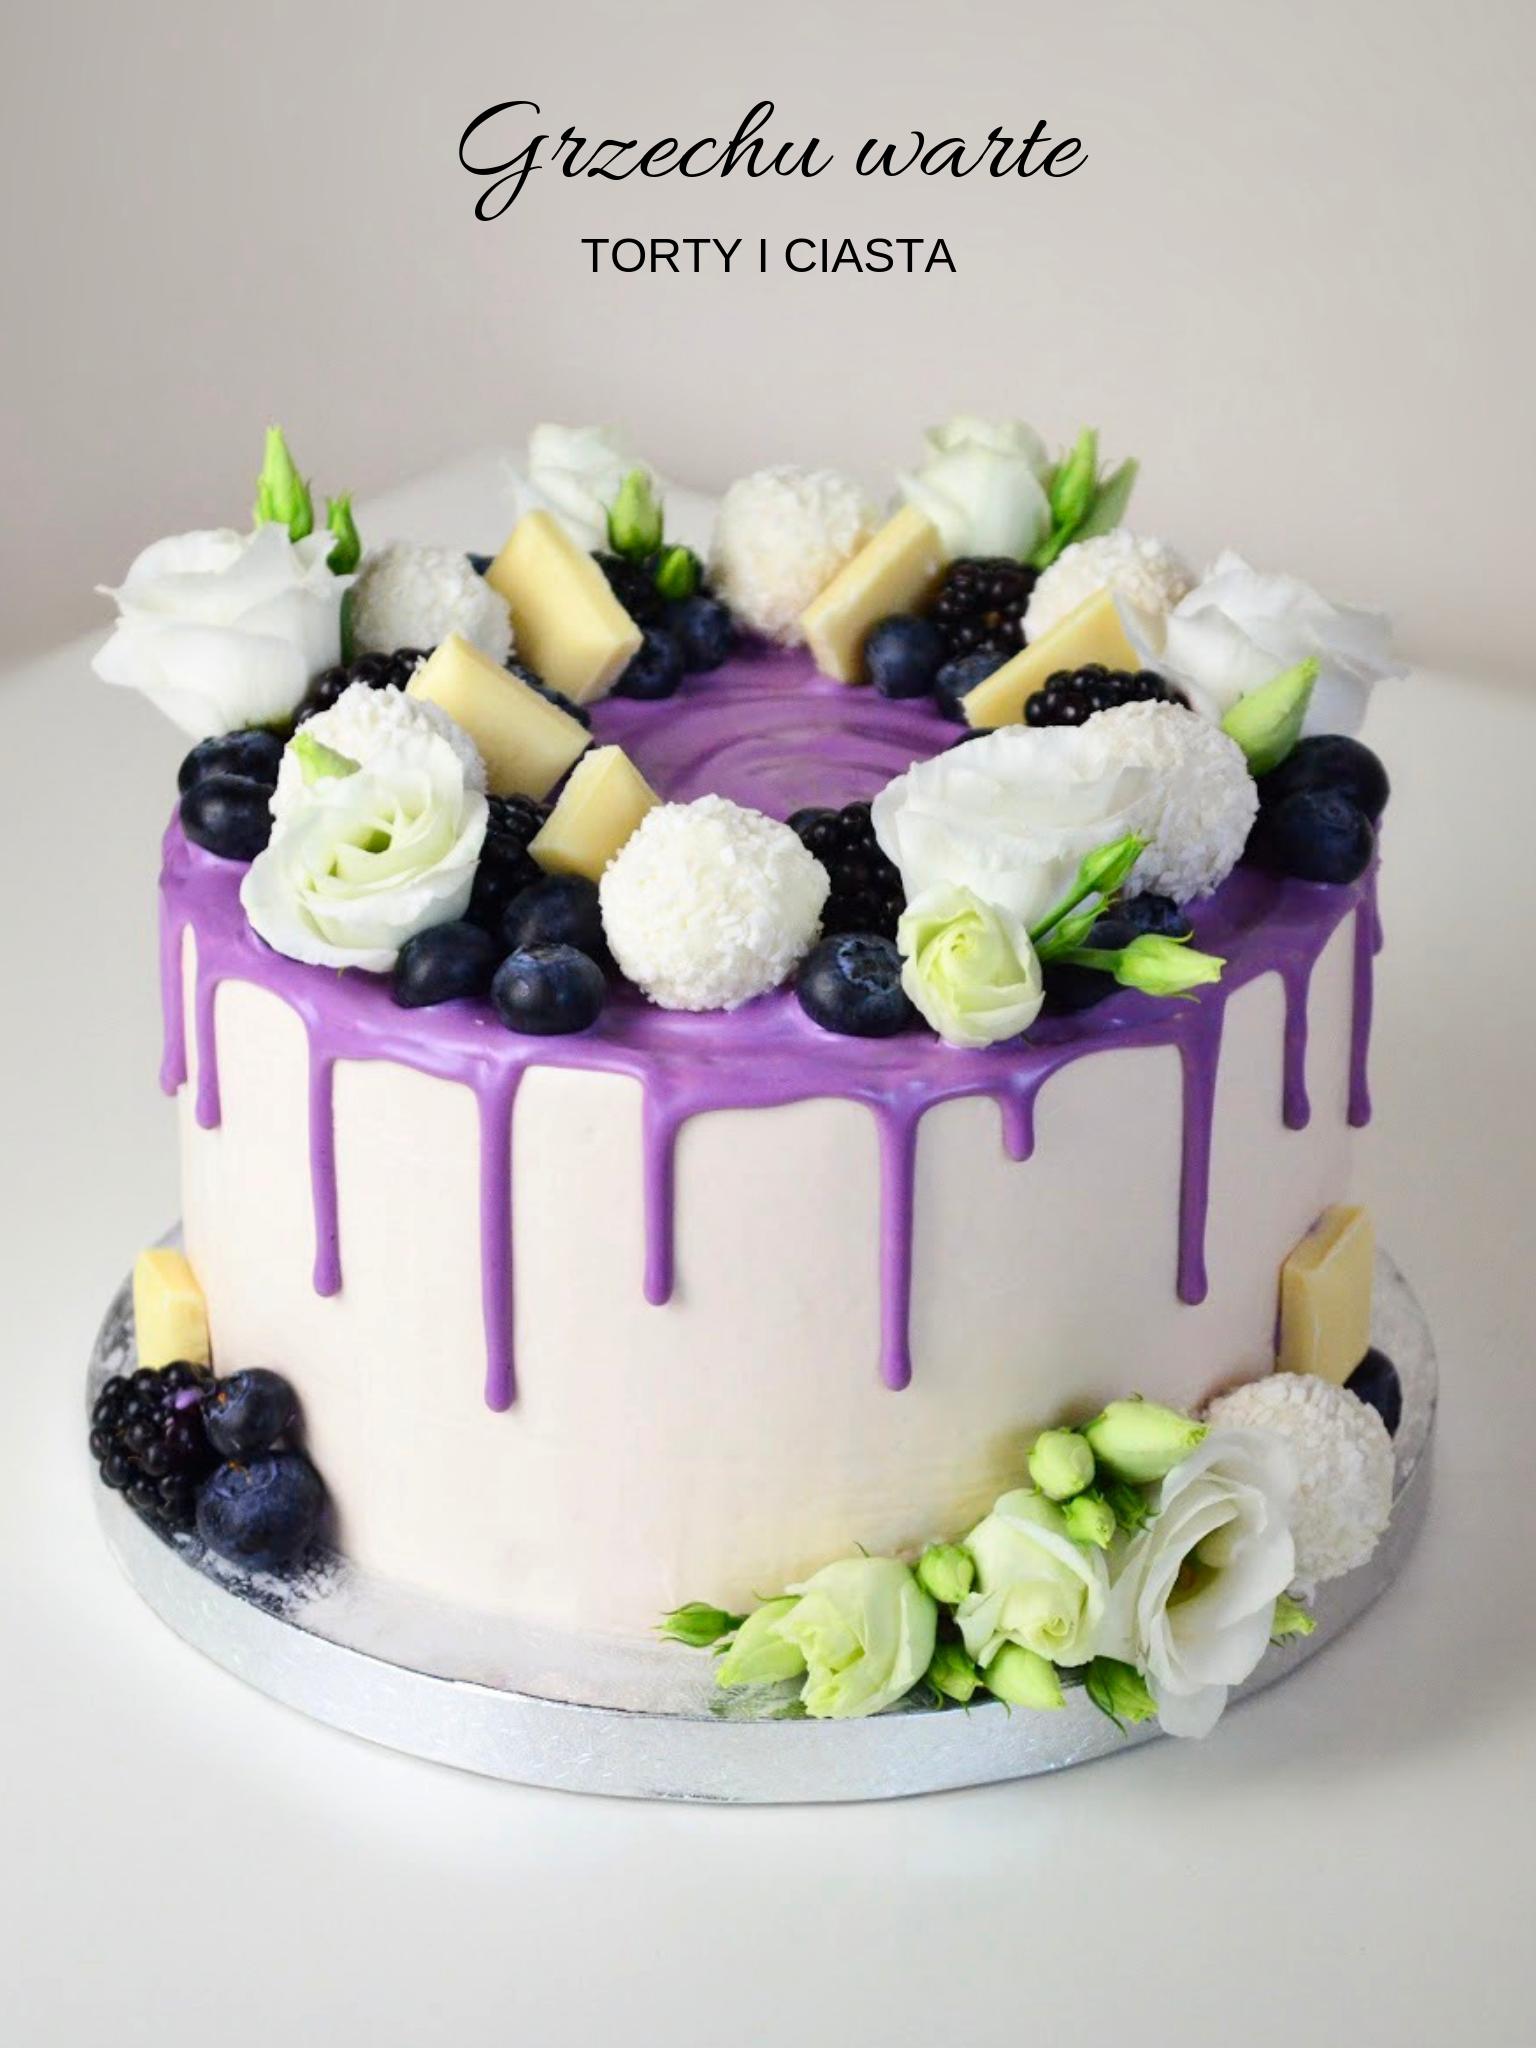 Fioletowy Torcik Cake Decorating Cake Desserts